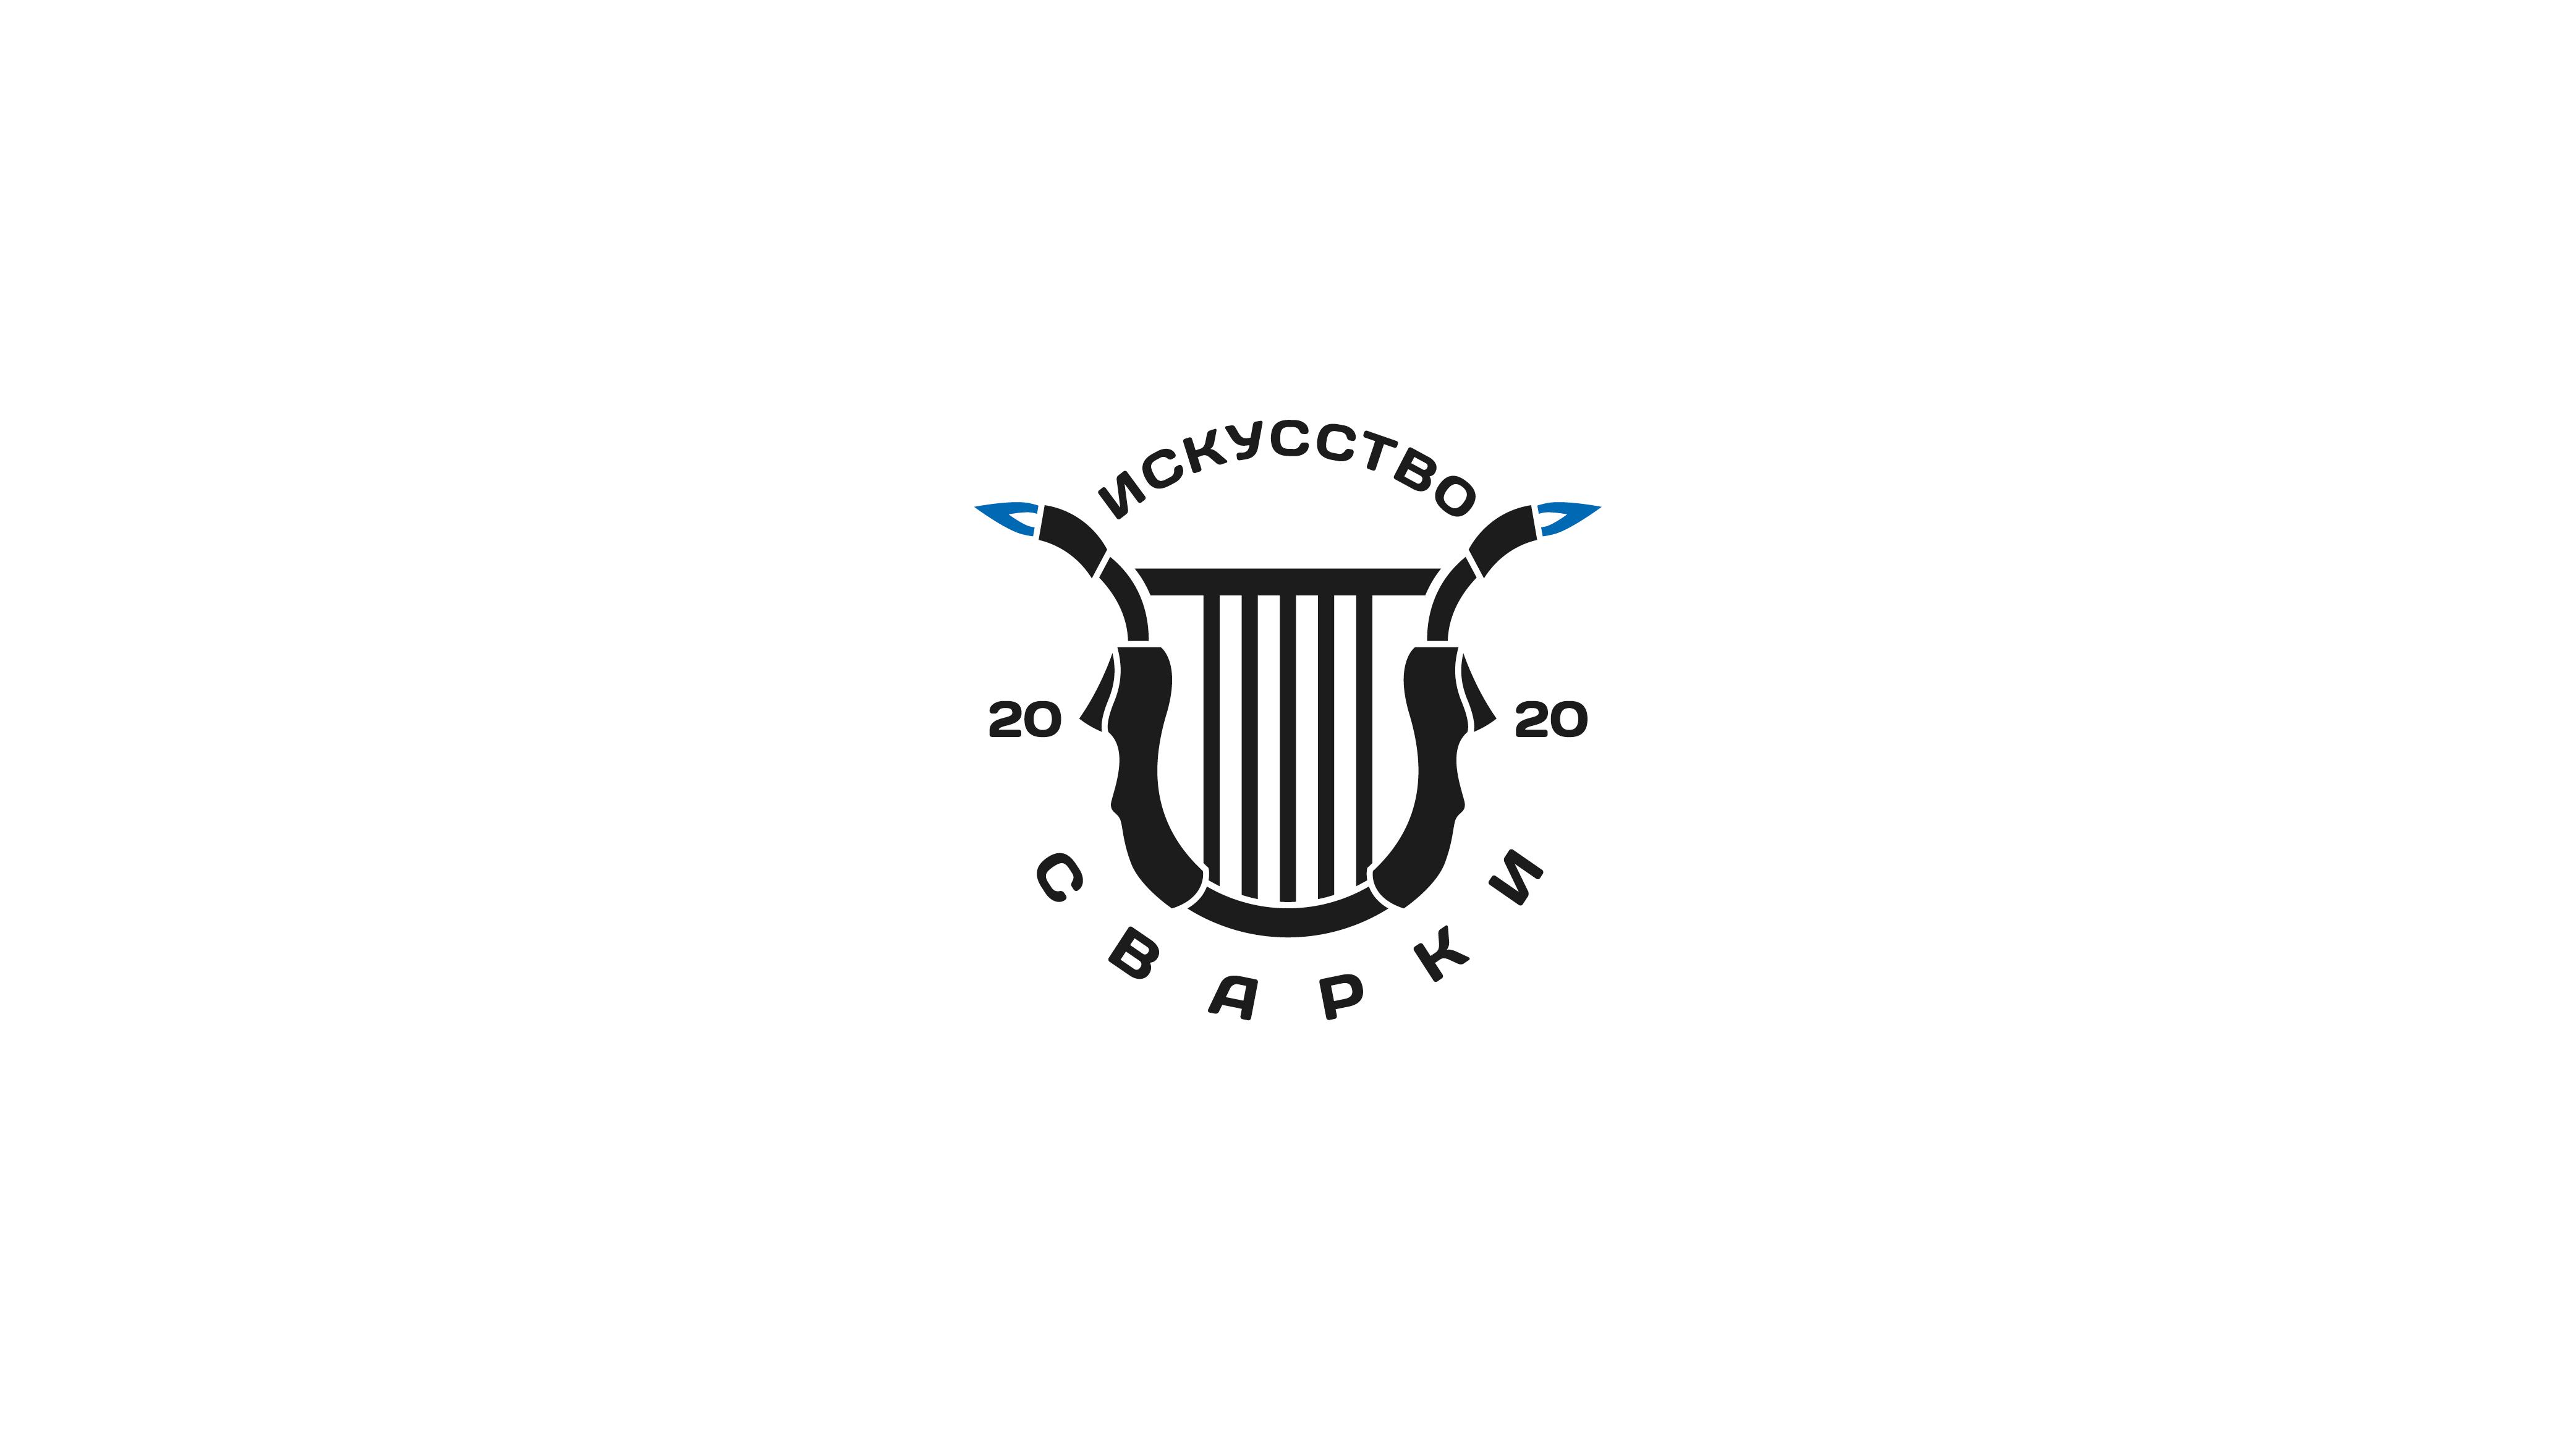 Разработка логотипа для Конкурса фото f_2035f6efa13b15f9.jpg